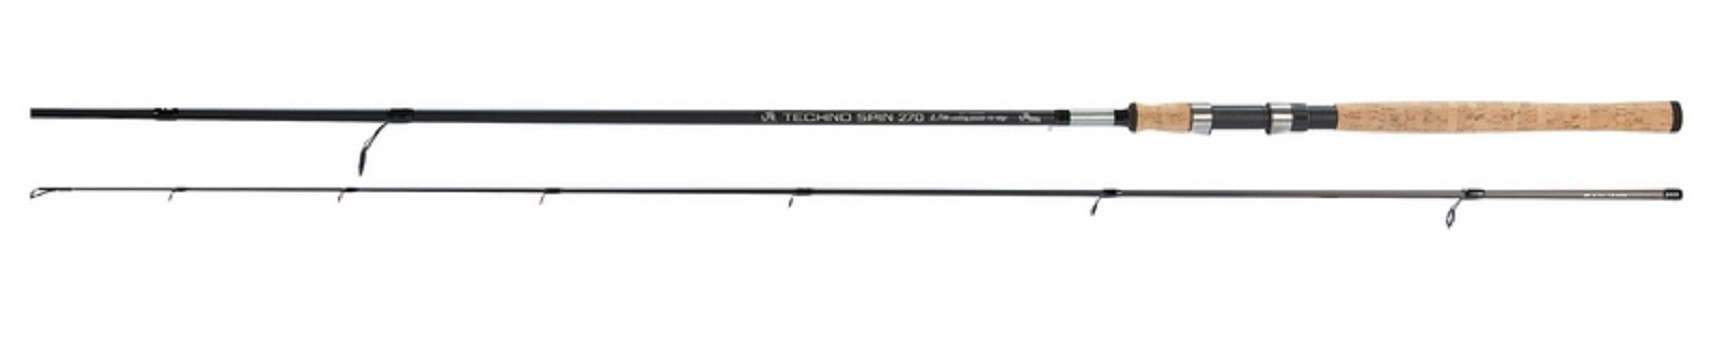 Techno Spin 2,4 m 10-30 gr Fil Fishing štap